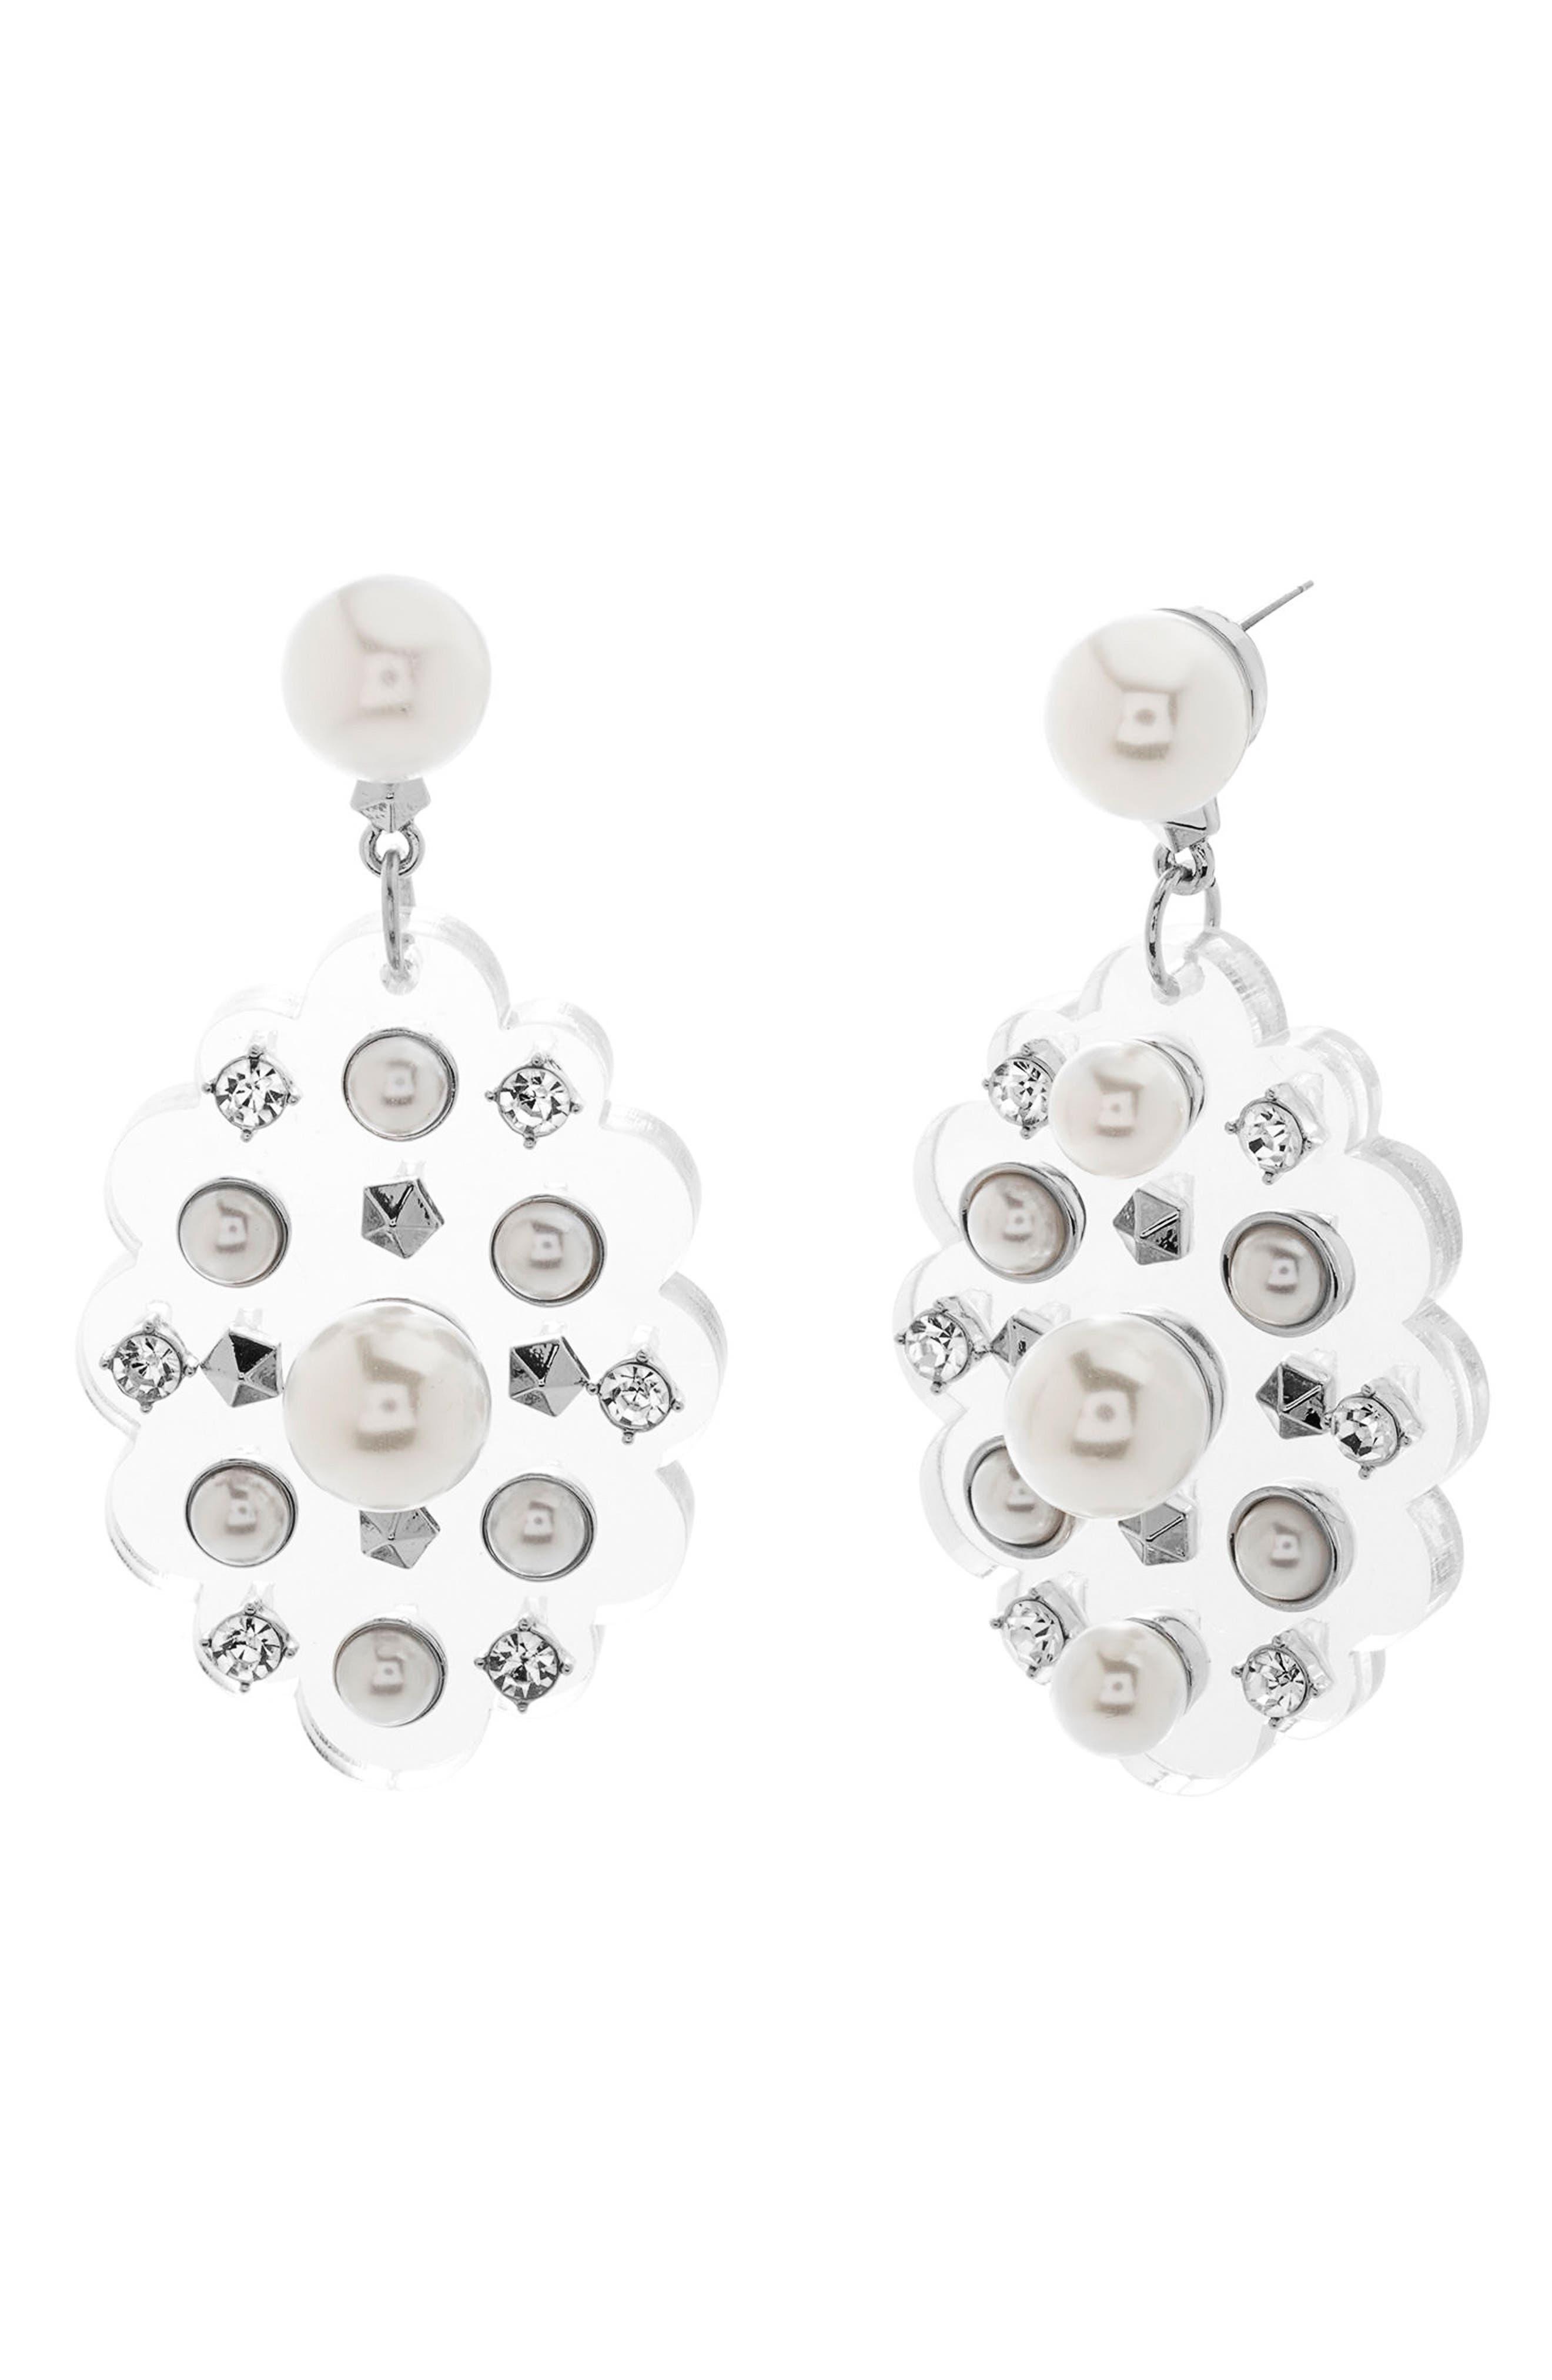 Crystal Drop Earrings,                             Main thumbnail 1, color,                             900